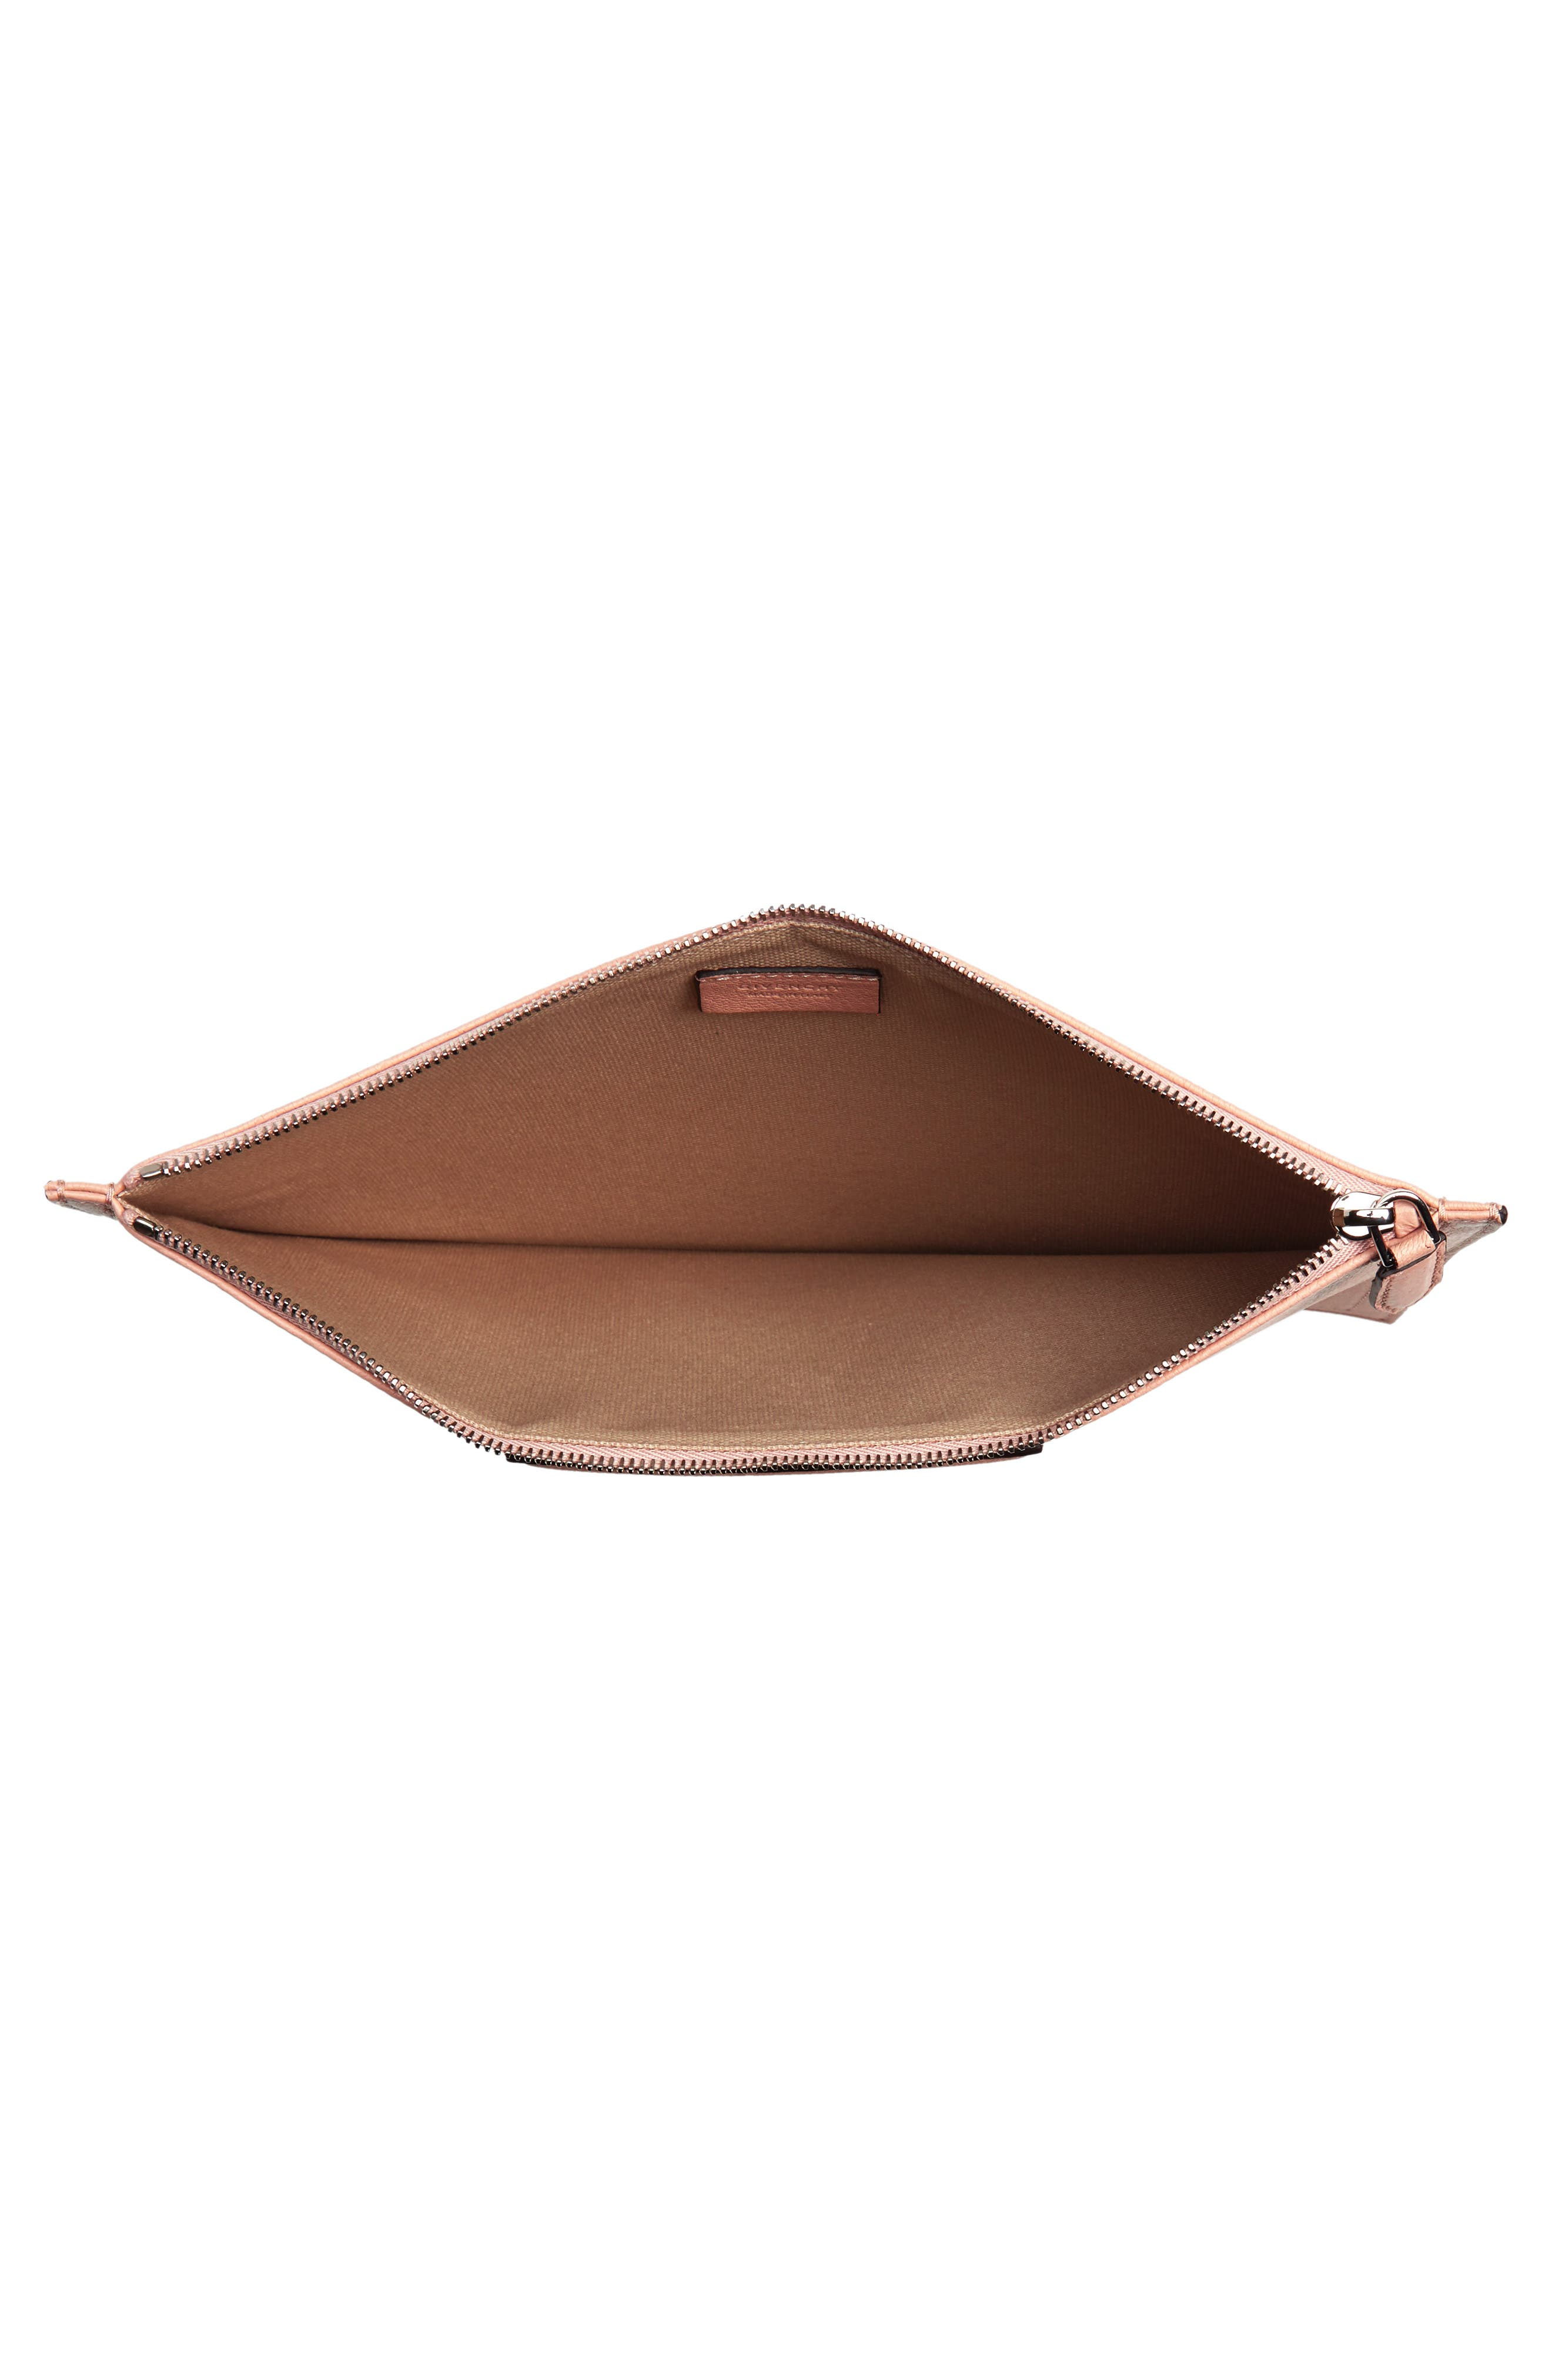 Medium Antigona Leather Pouch,                             Alternate thumbnail 4, color,                             Powder